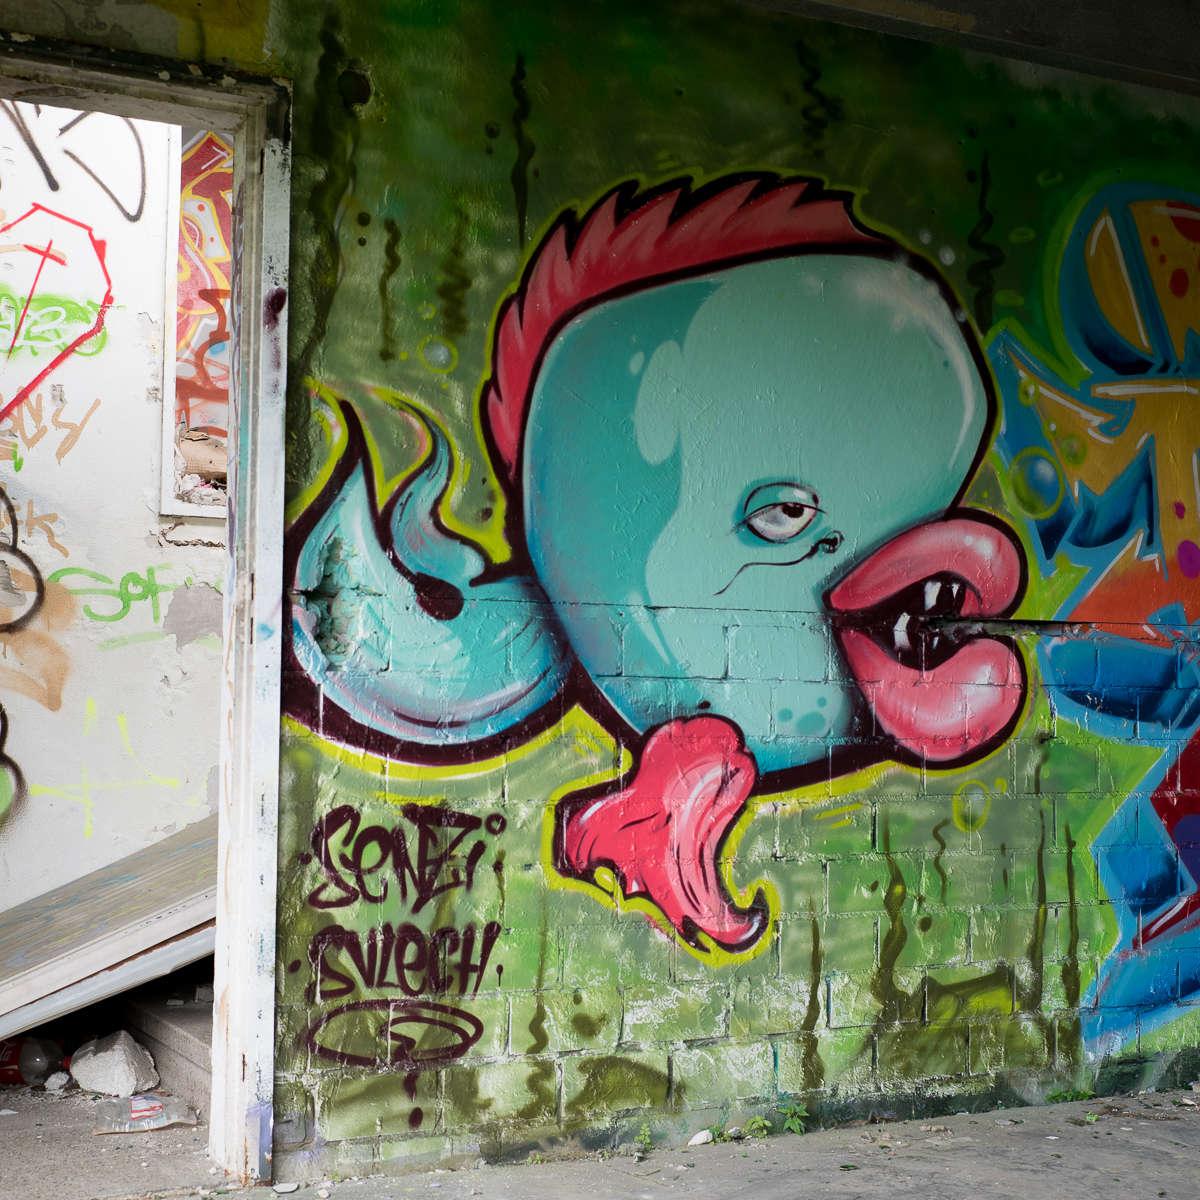 Ruheorte - Sessel, Graffiti und anderer Müll